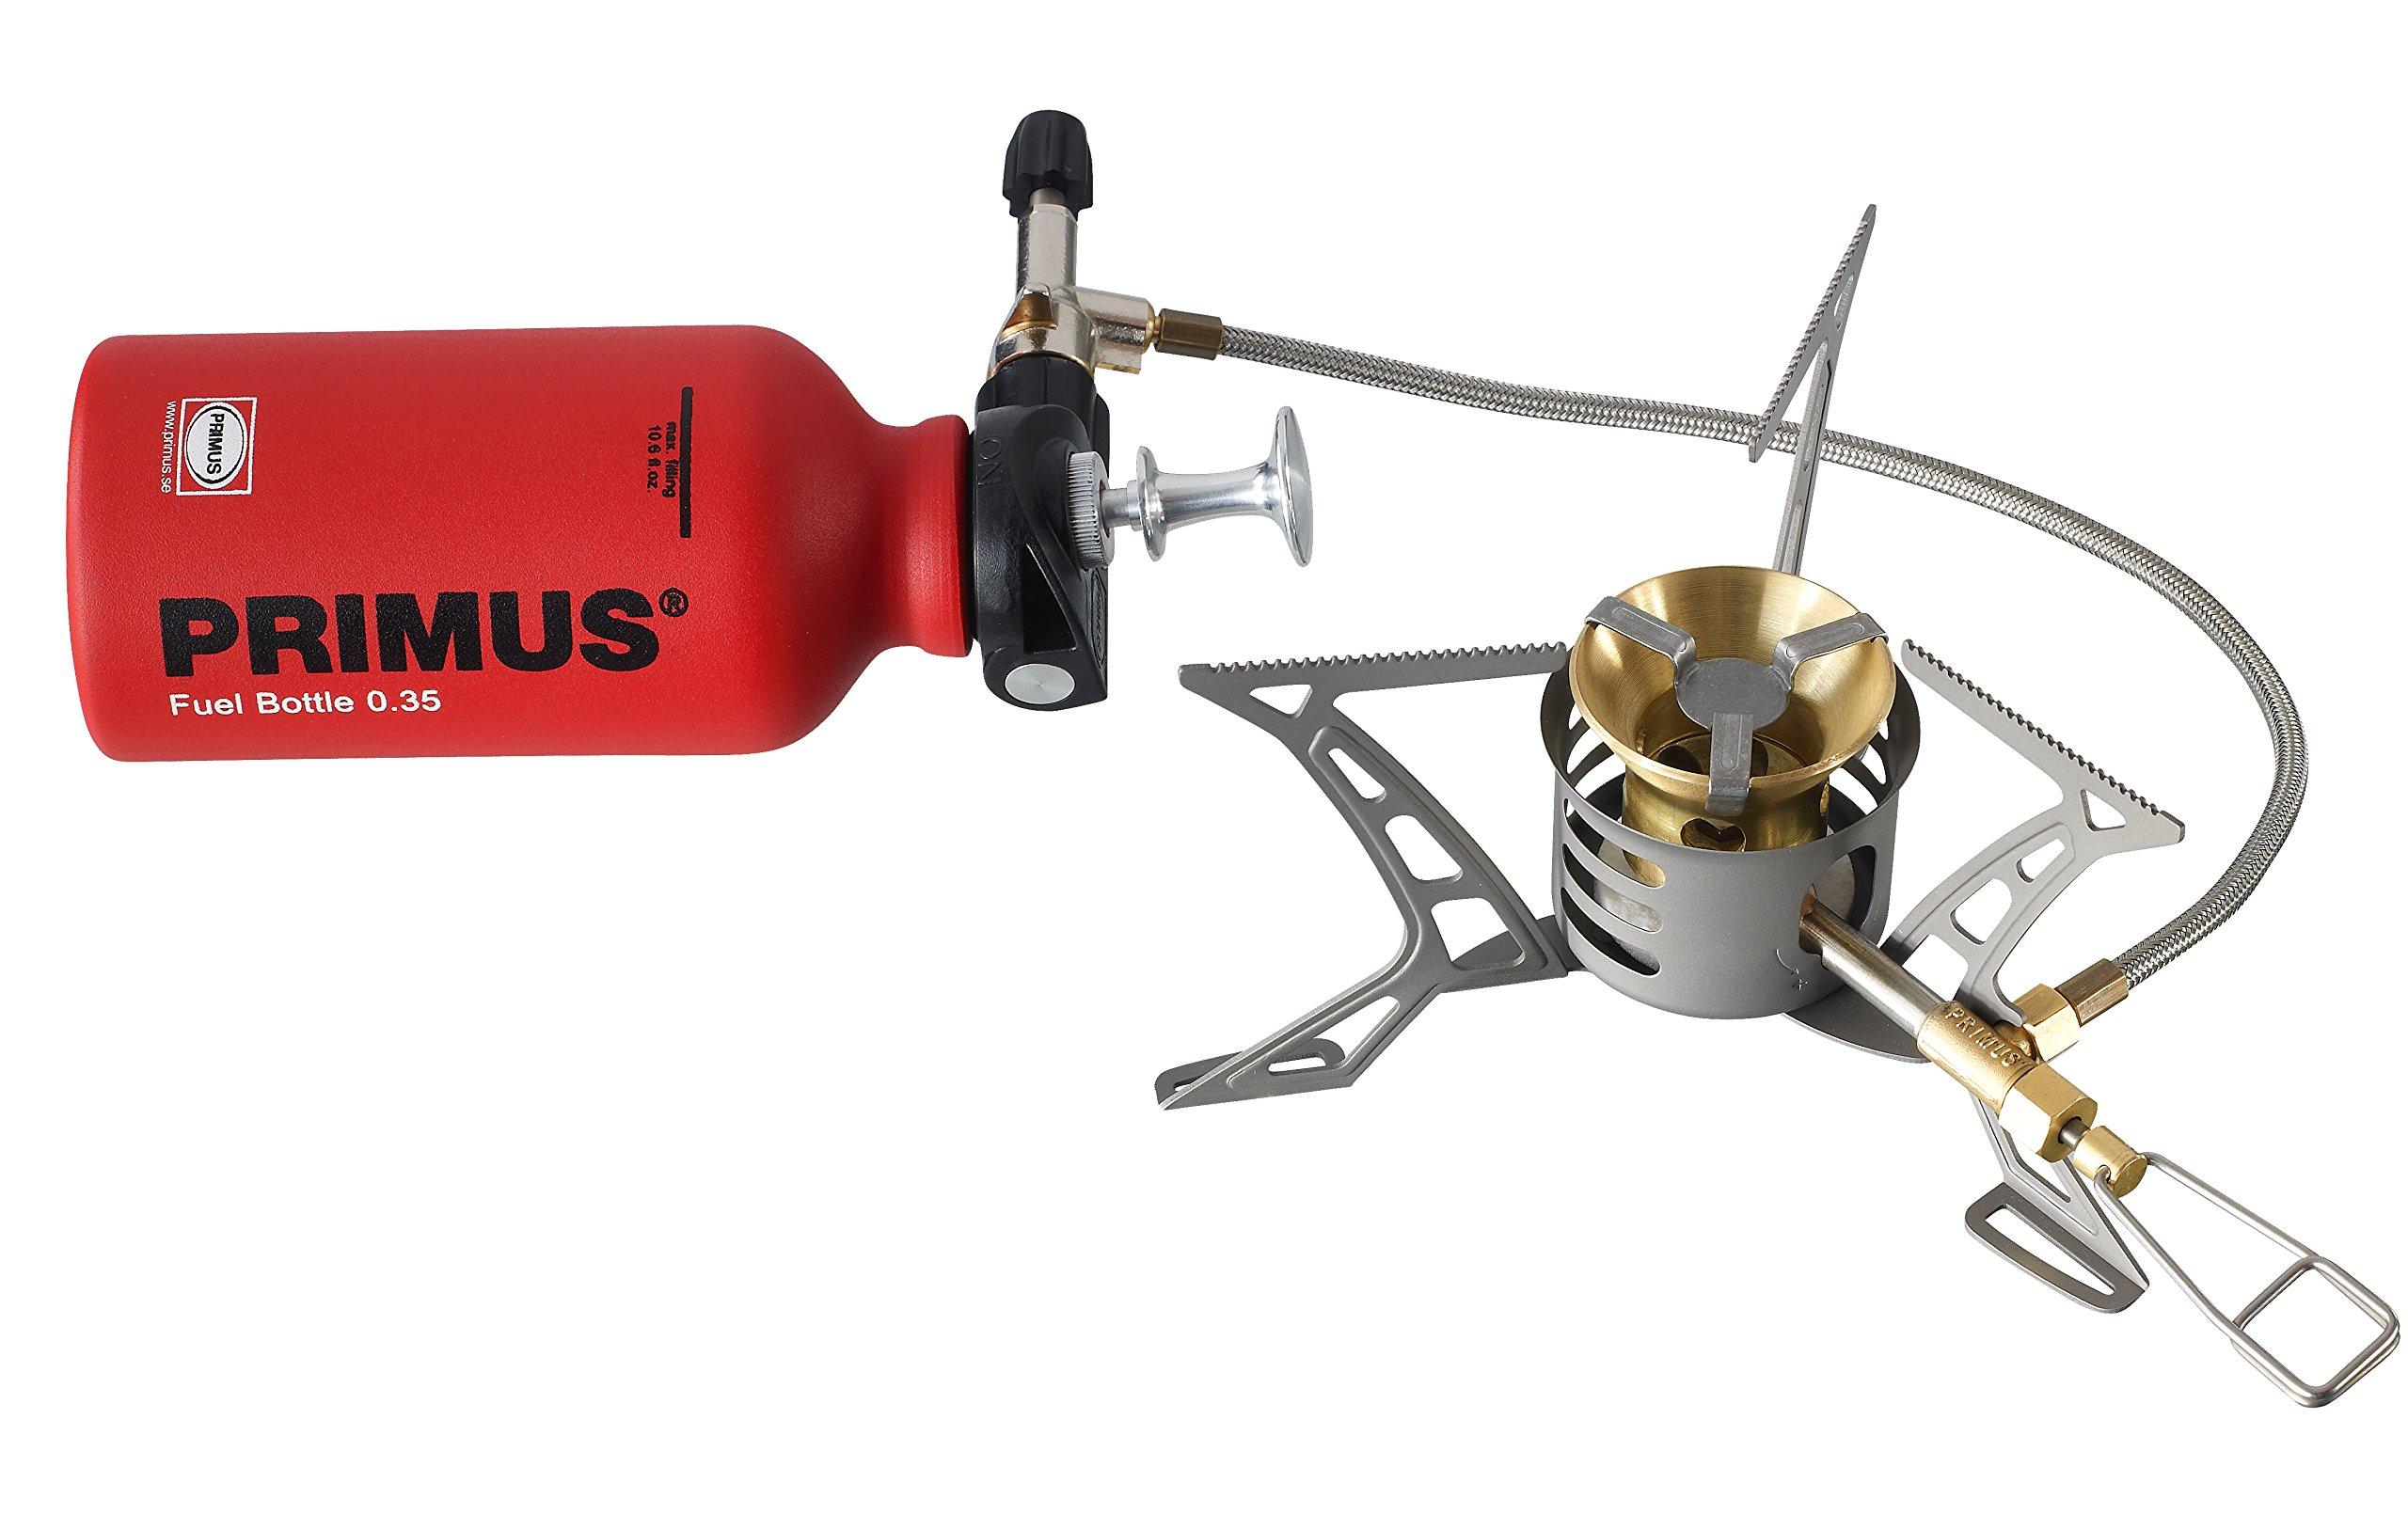 Primus OmniLite TI camping stove grey camping stove by Primus (Image #3)